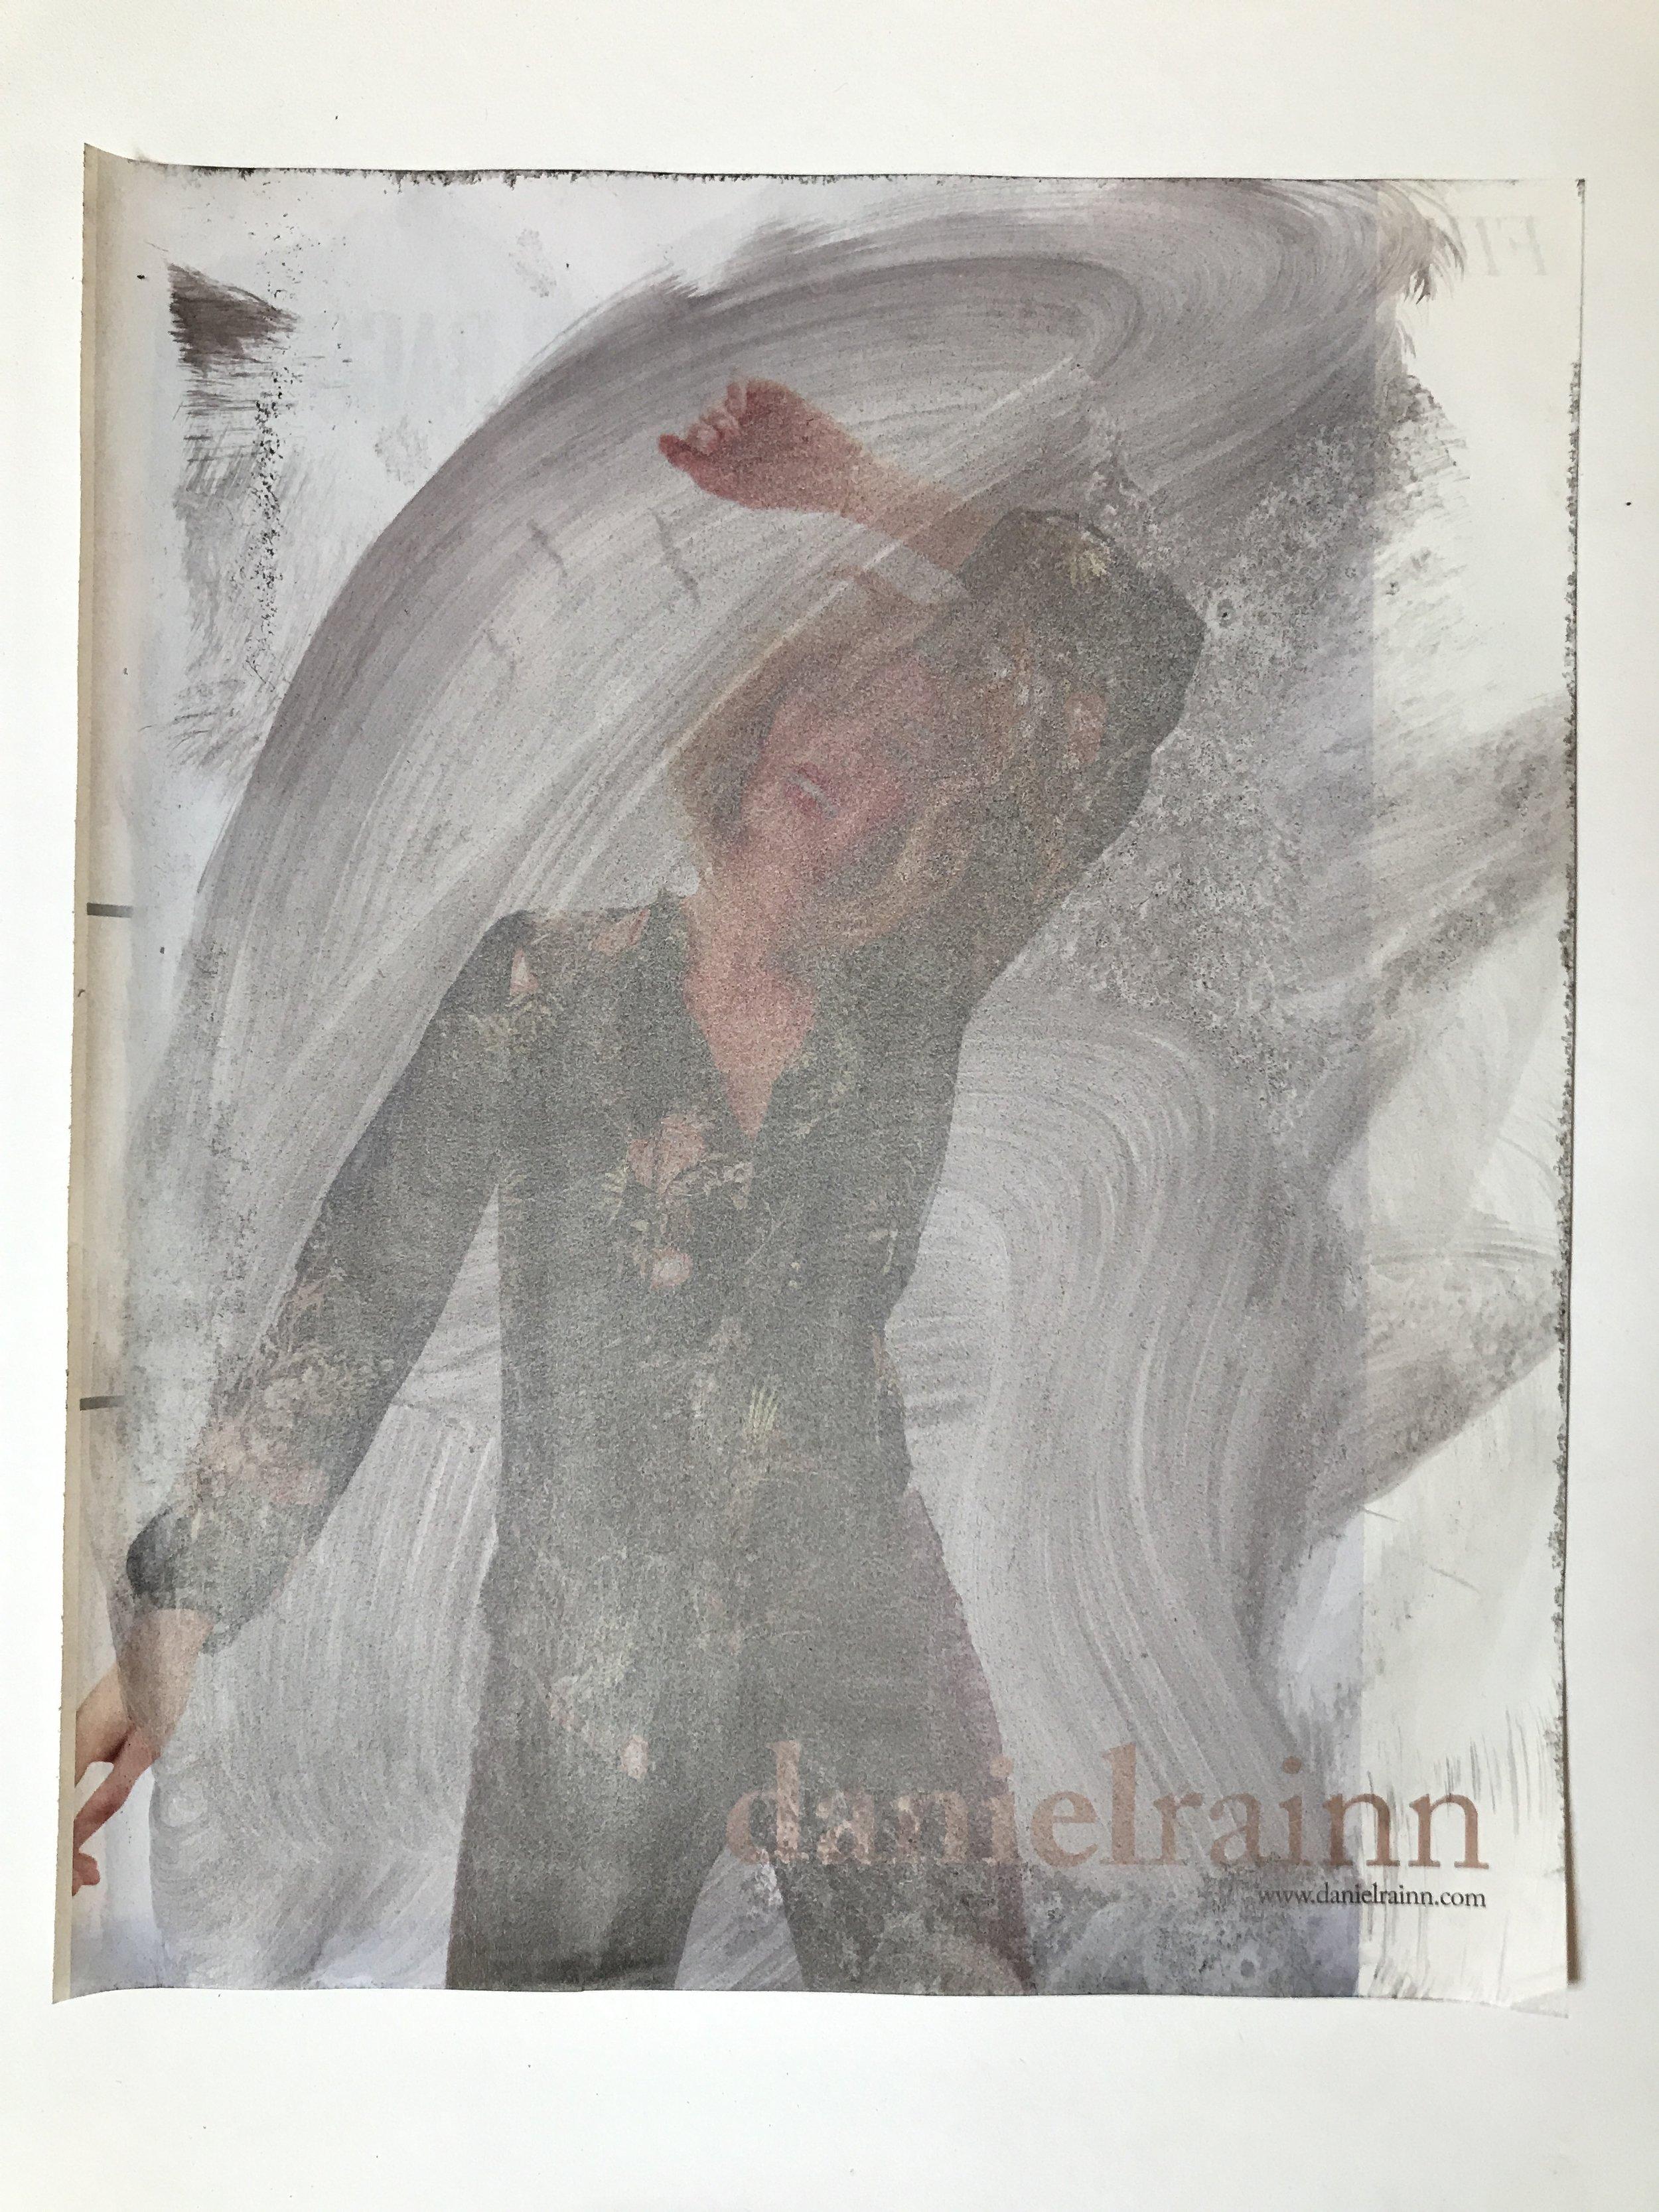 danielrainn   2018  citra solv on magazine page